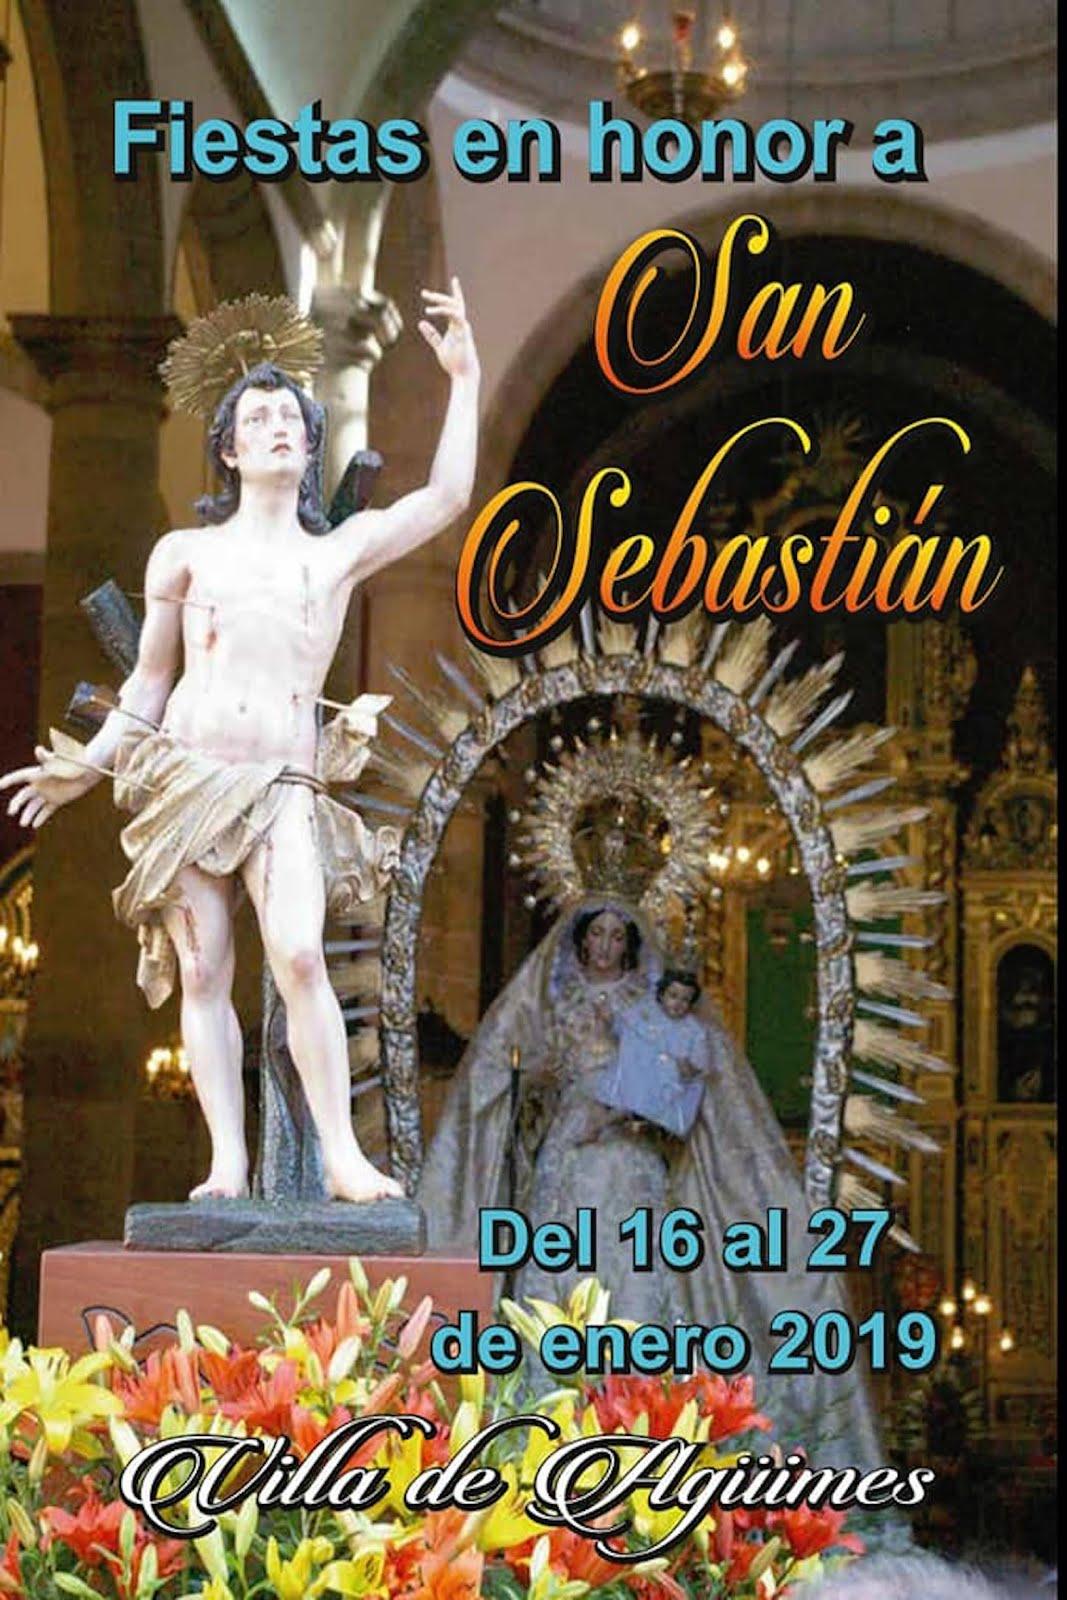 Fiestas en honor a San Sebastián 2019